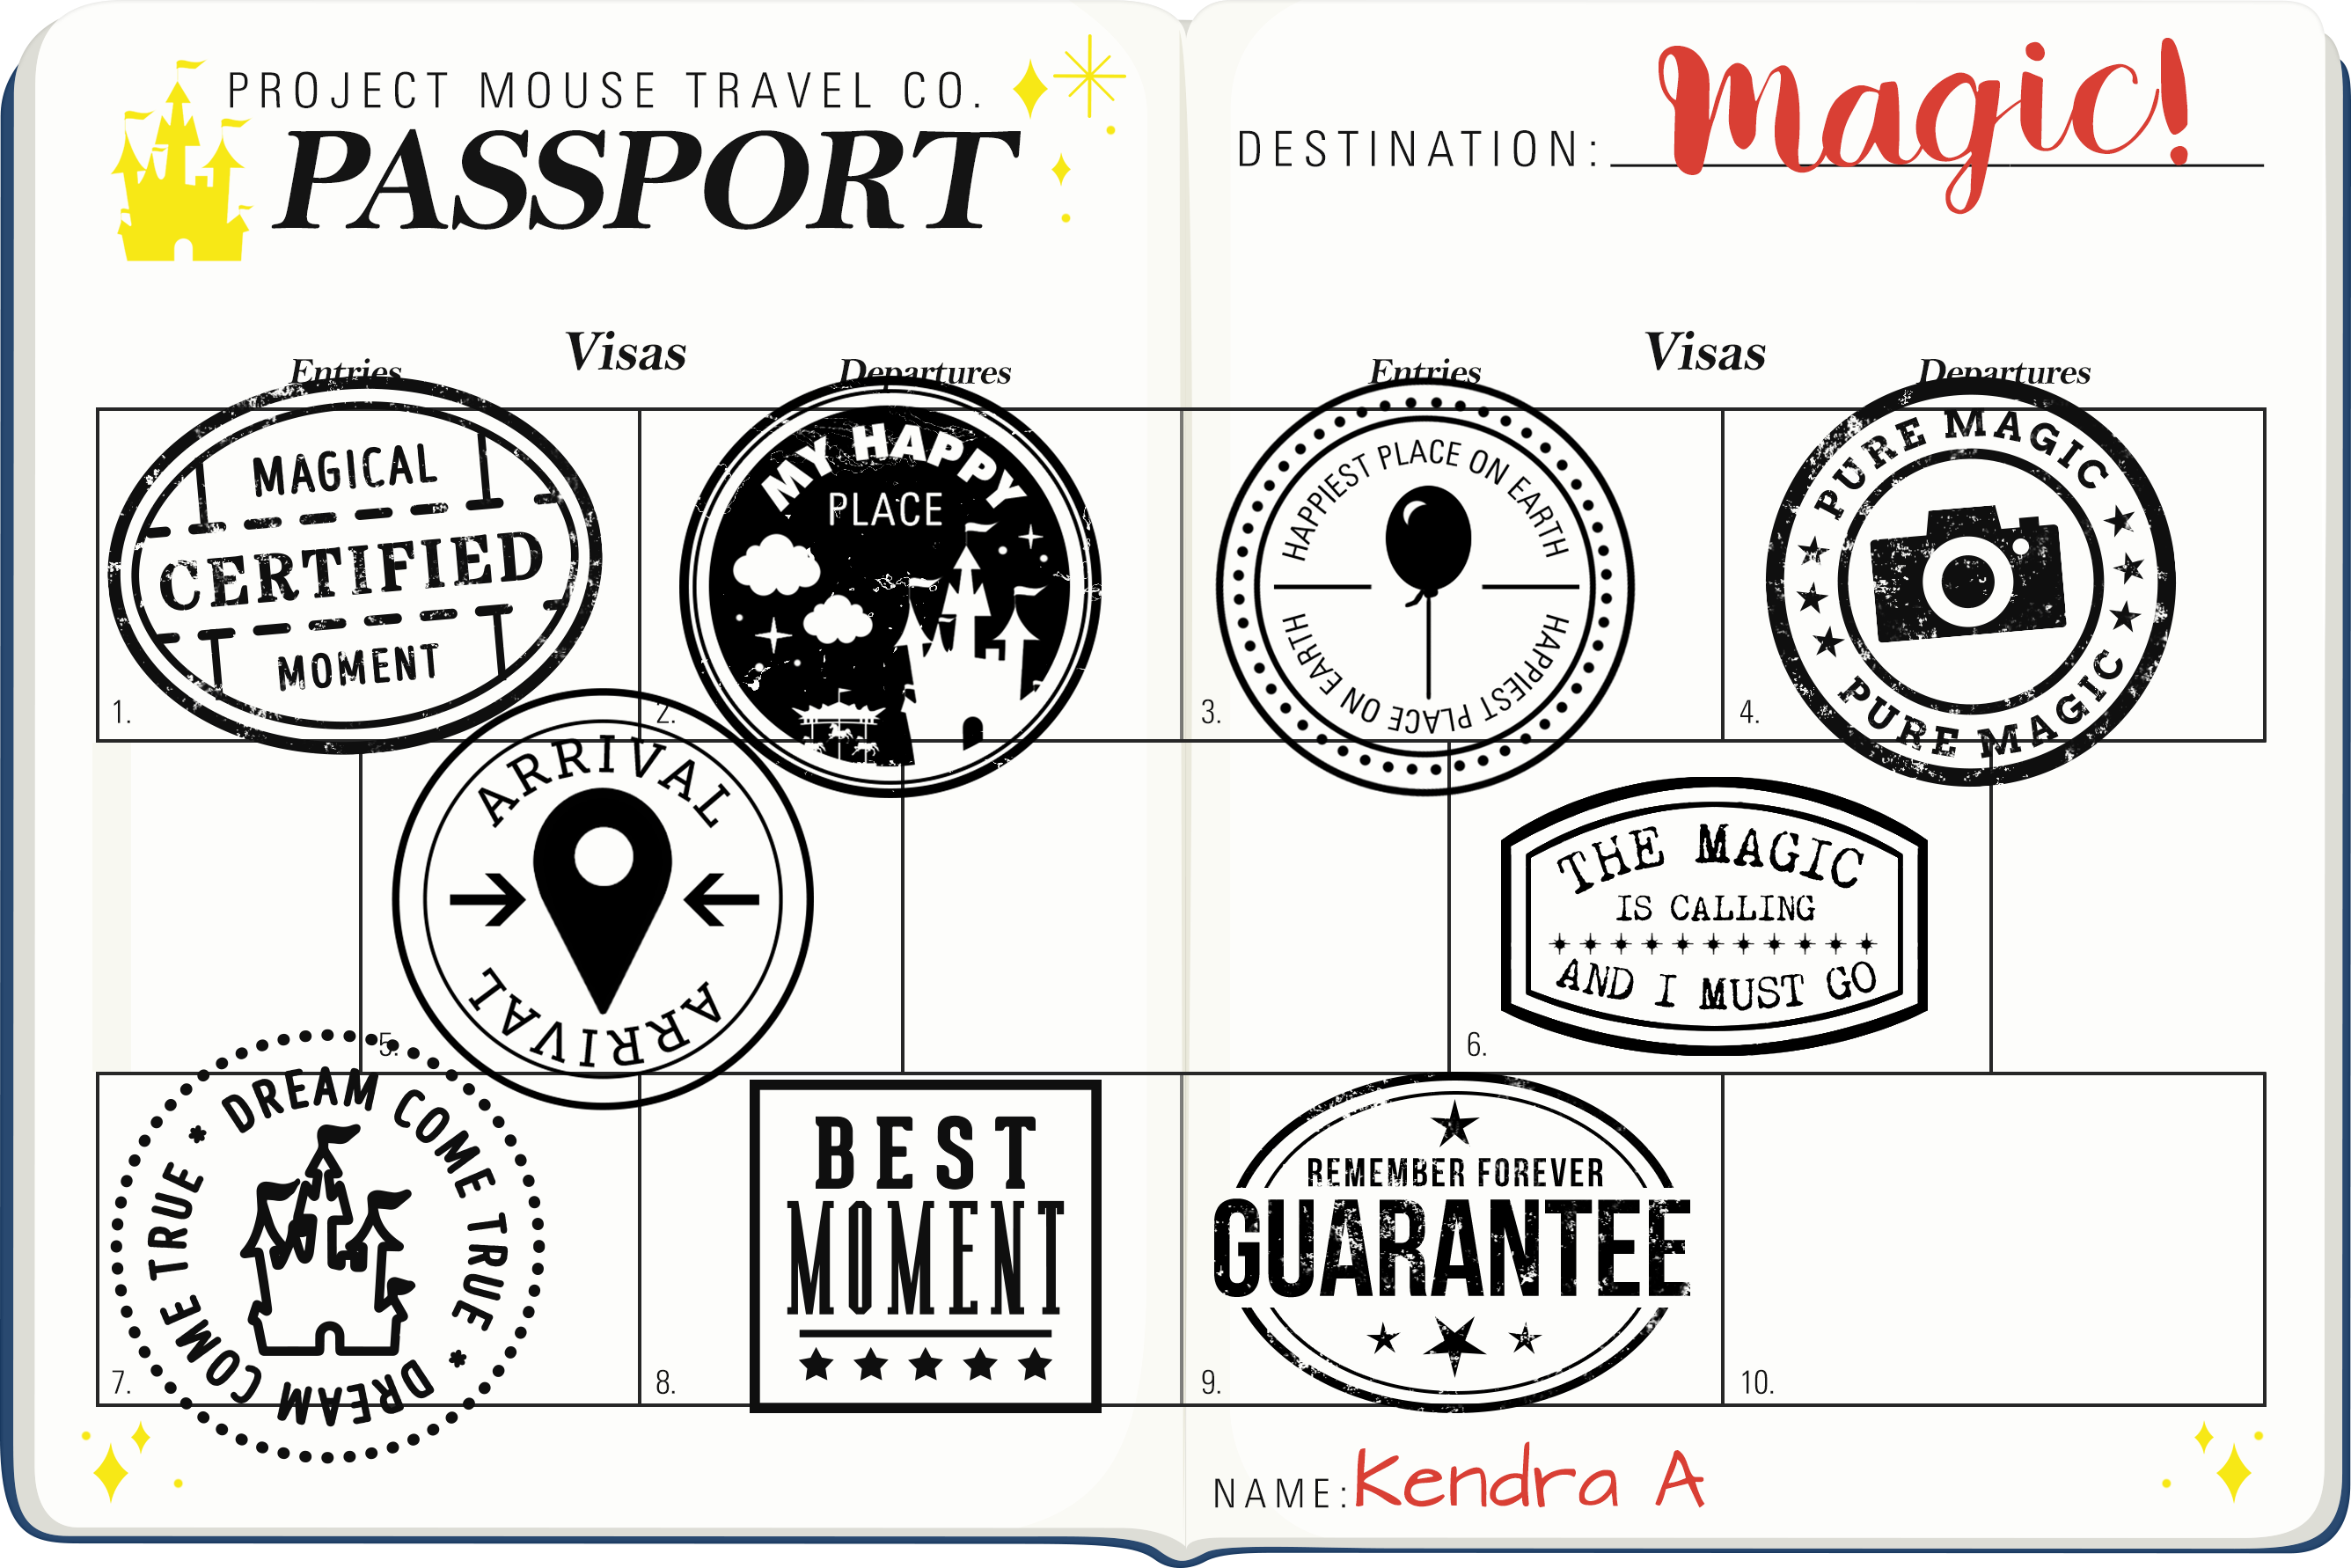 kendra aumack - pm_stamps_passport.png